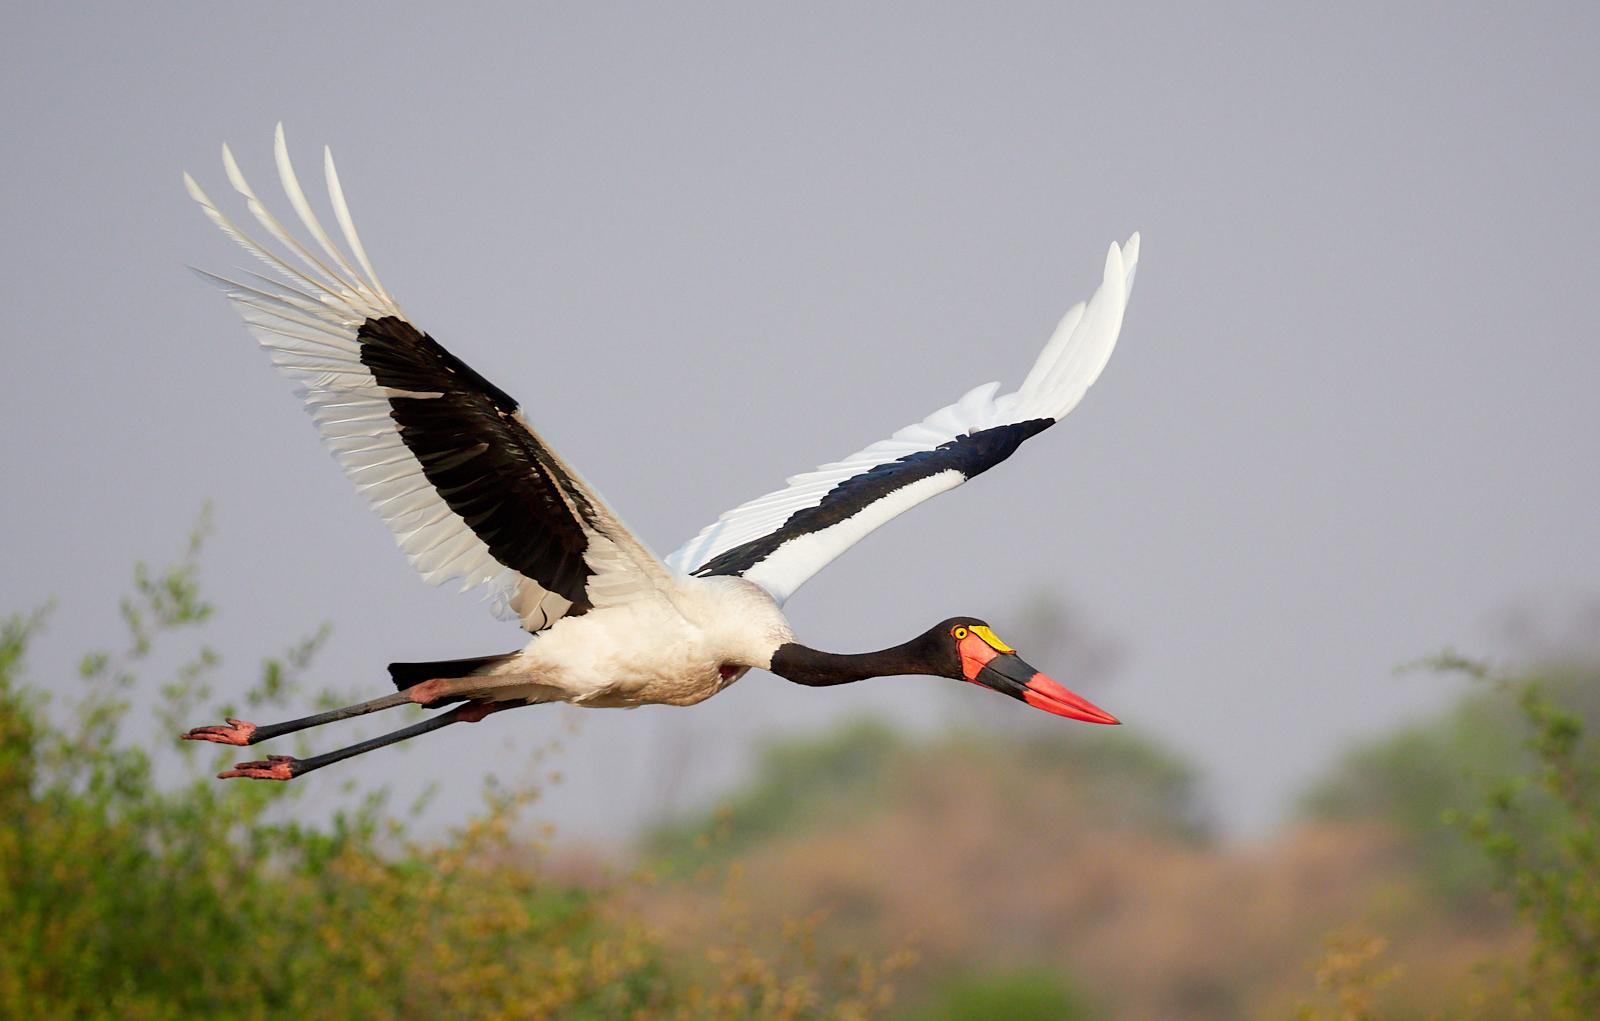 Saddle-billed stork 1600x1200 sRGB.jpg